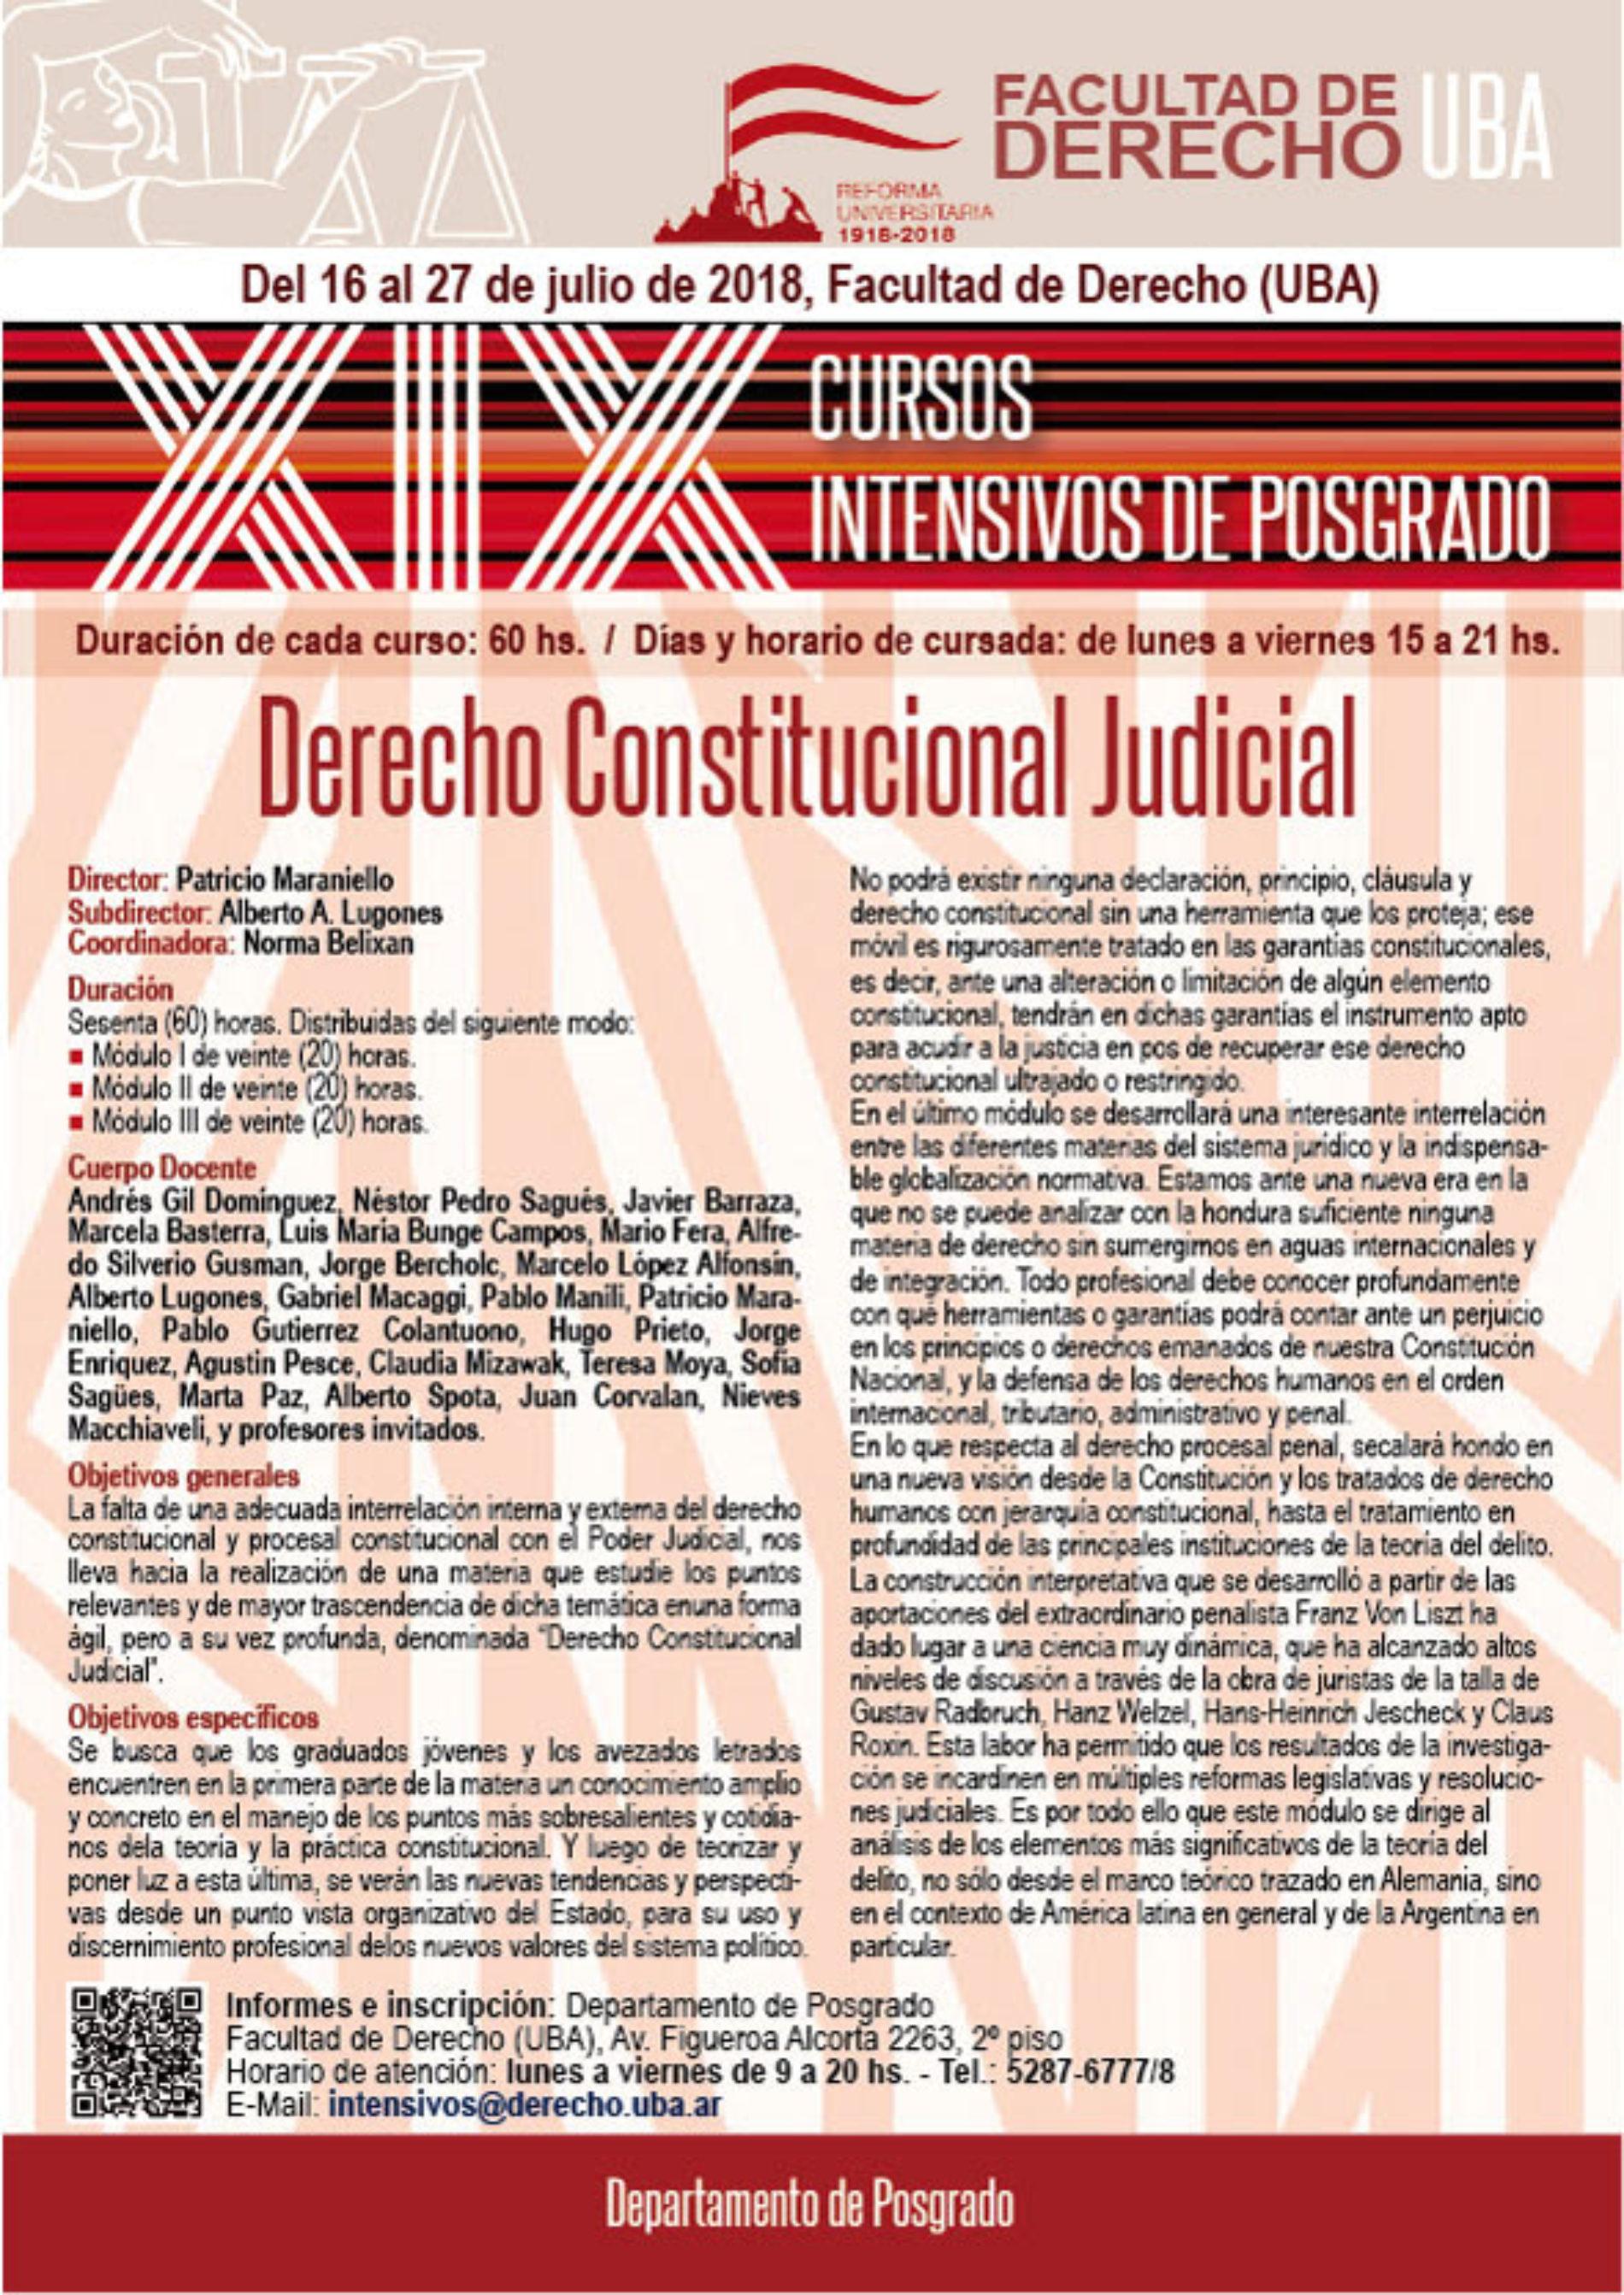 XIX Cursos Intensivos de Posgrado – Derecho Constitucional Judicial